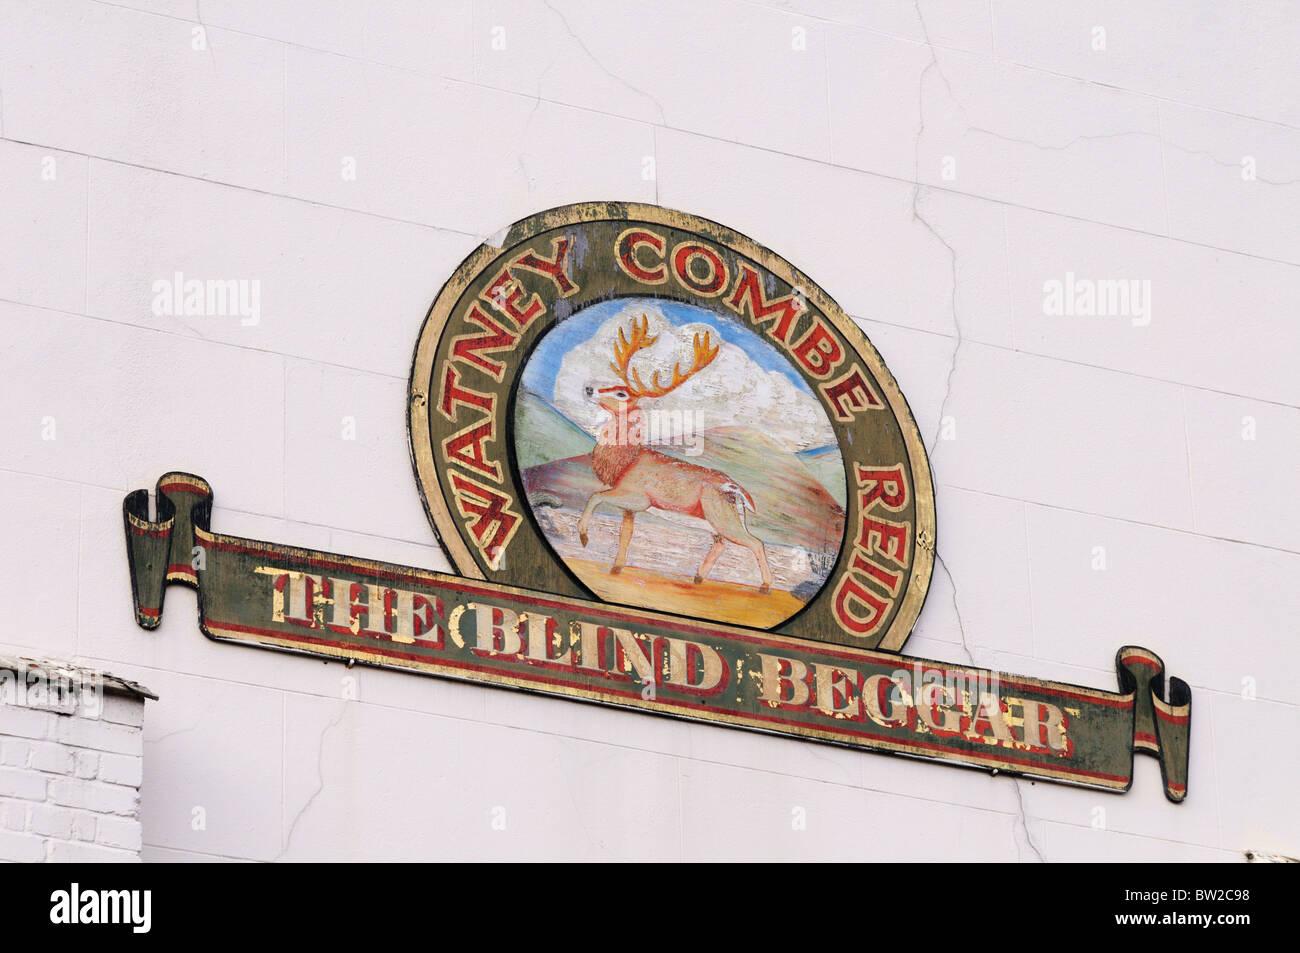 The Blind Beggar Pub, Whitechapel, Road, London, England, UK - Stock Image